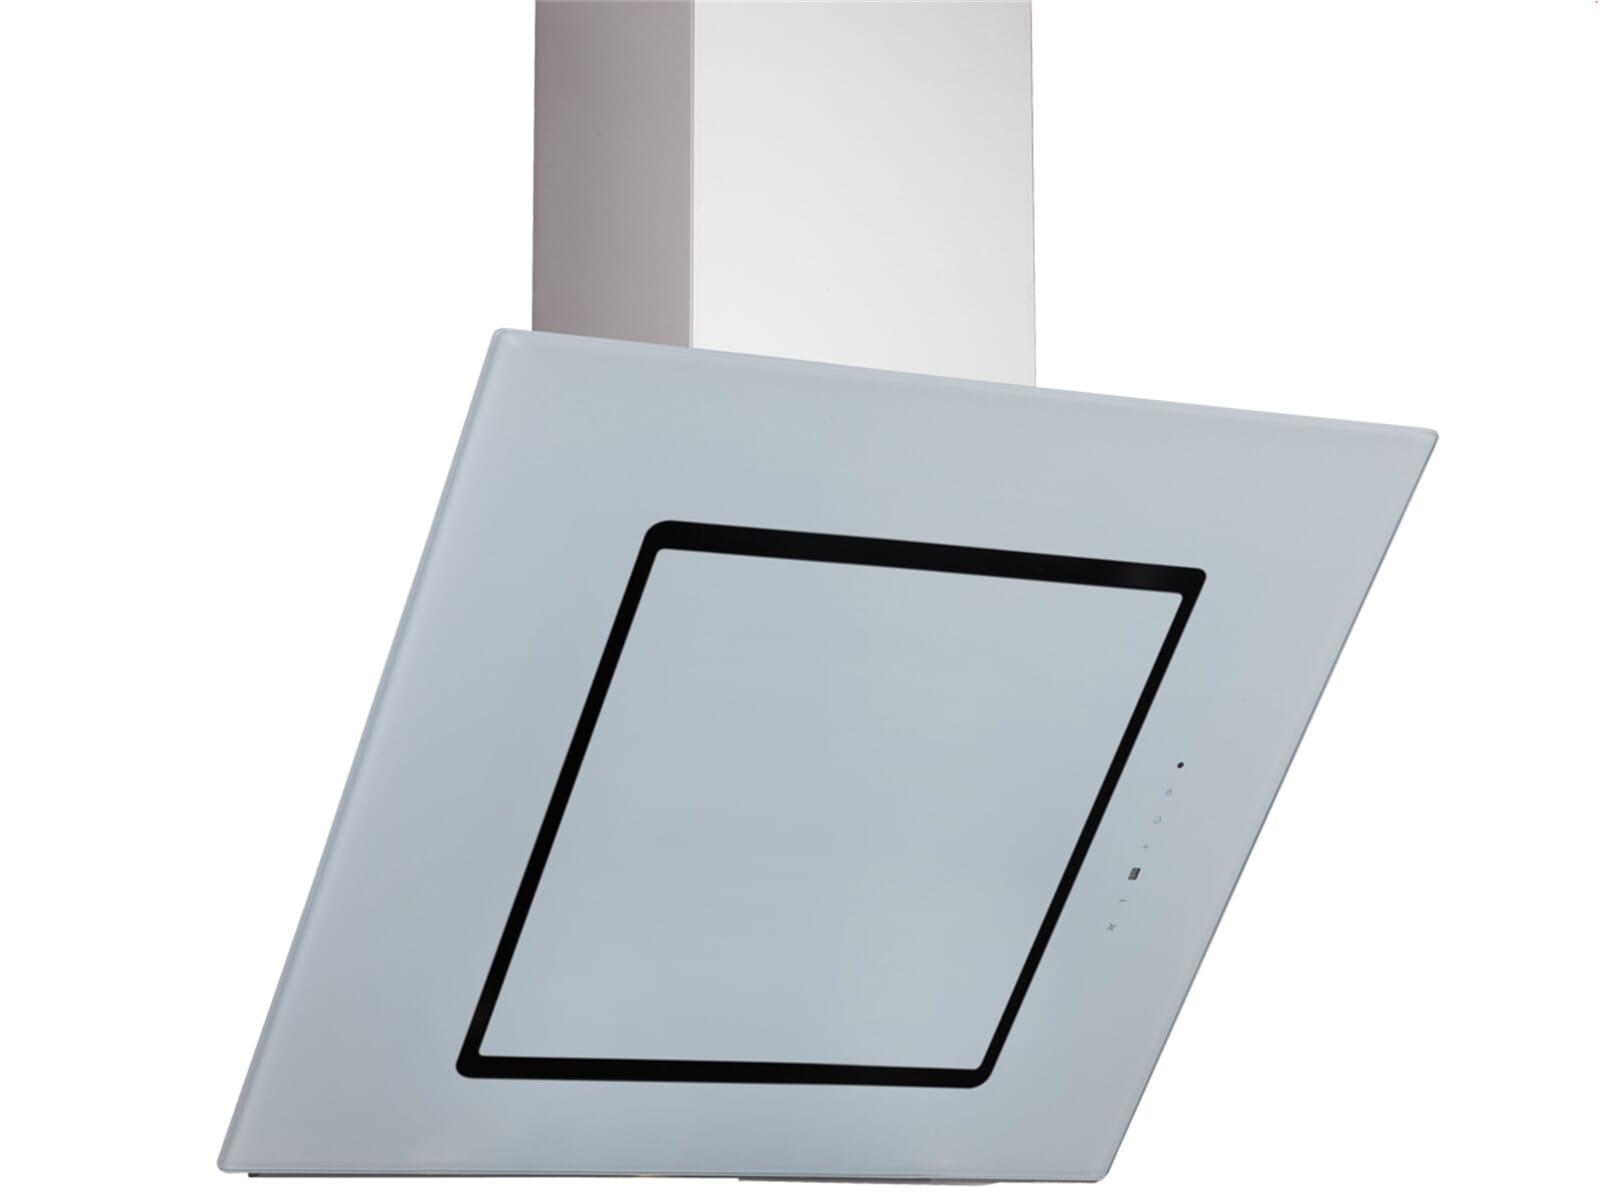 Silverline auriga auw 685.2 w kopffreihaube glas weiß